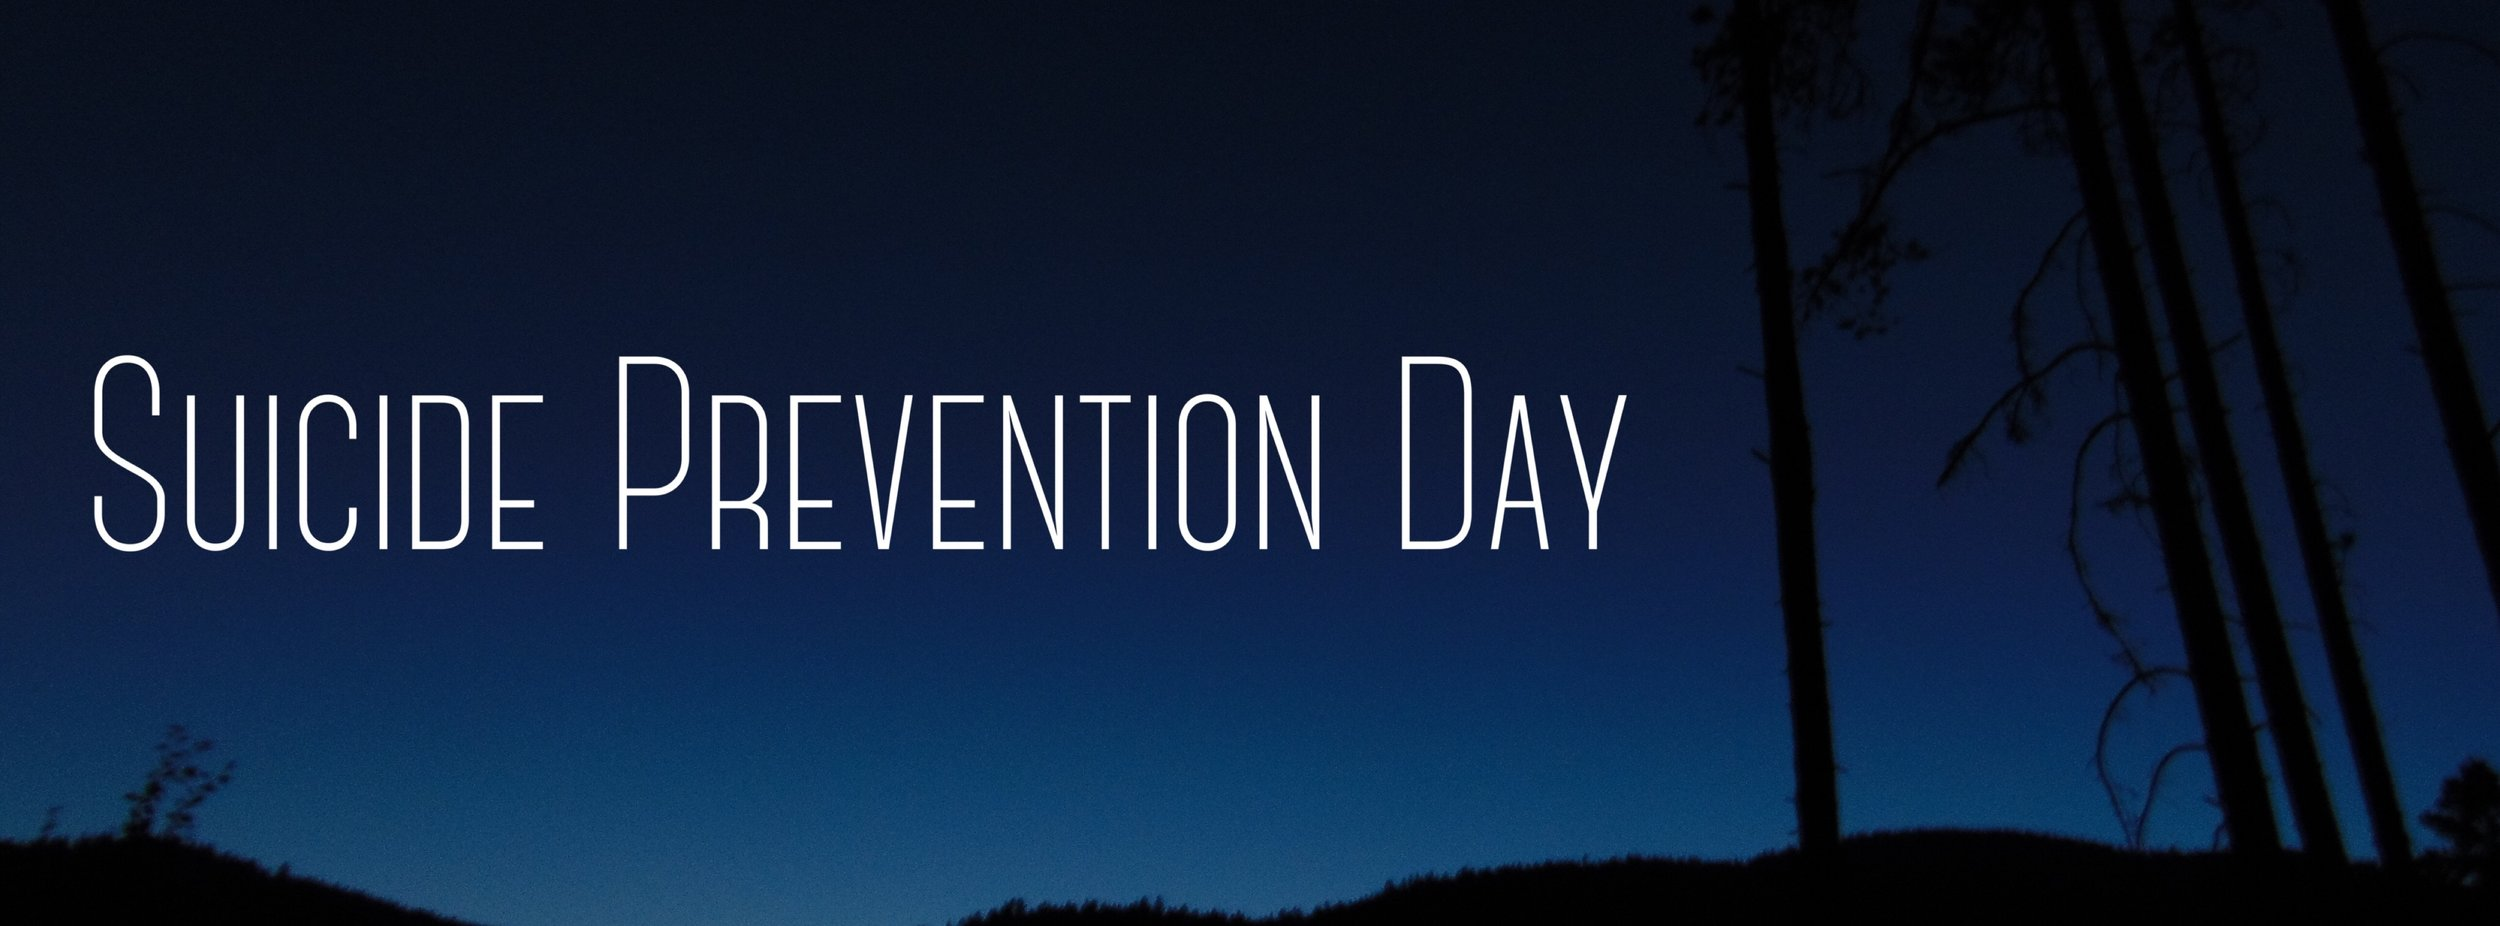 Suicide Prevention Reading List.jpg